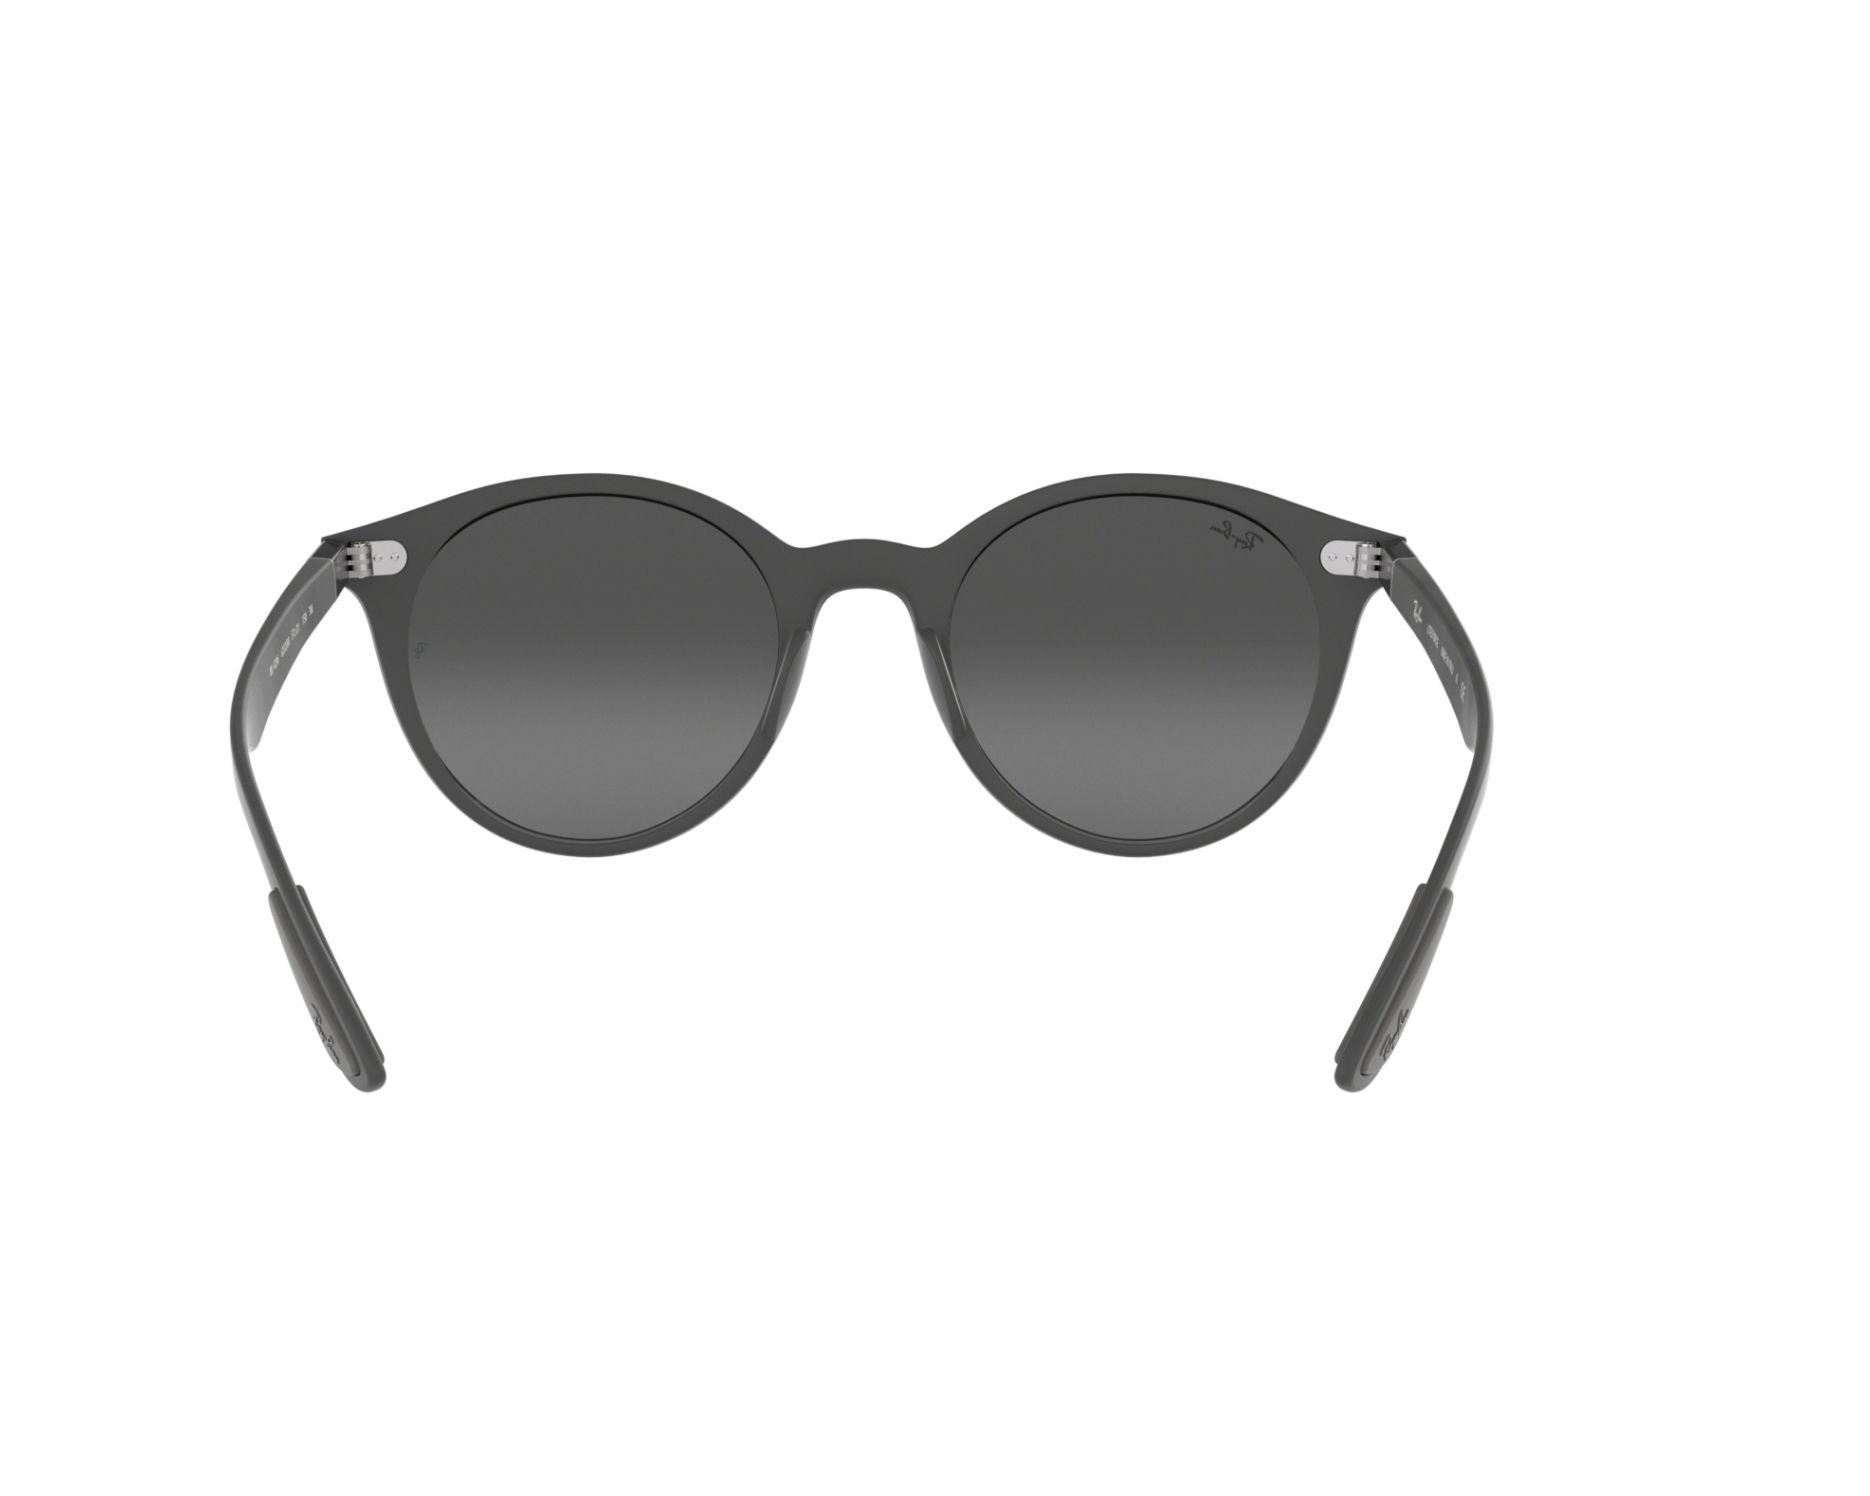 e8b508a442 Sunglasses Ray-Ban RB-4296 633288 51-21 Grey 360 degree view 7